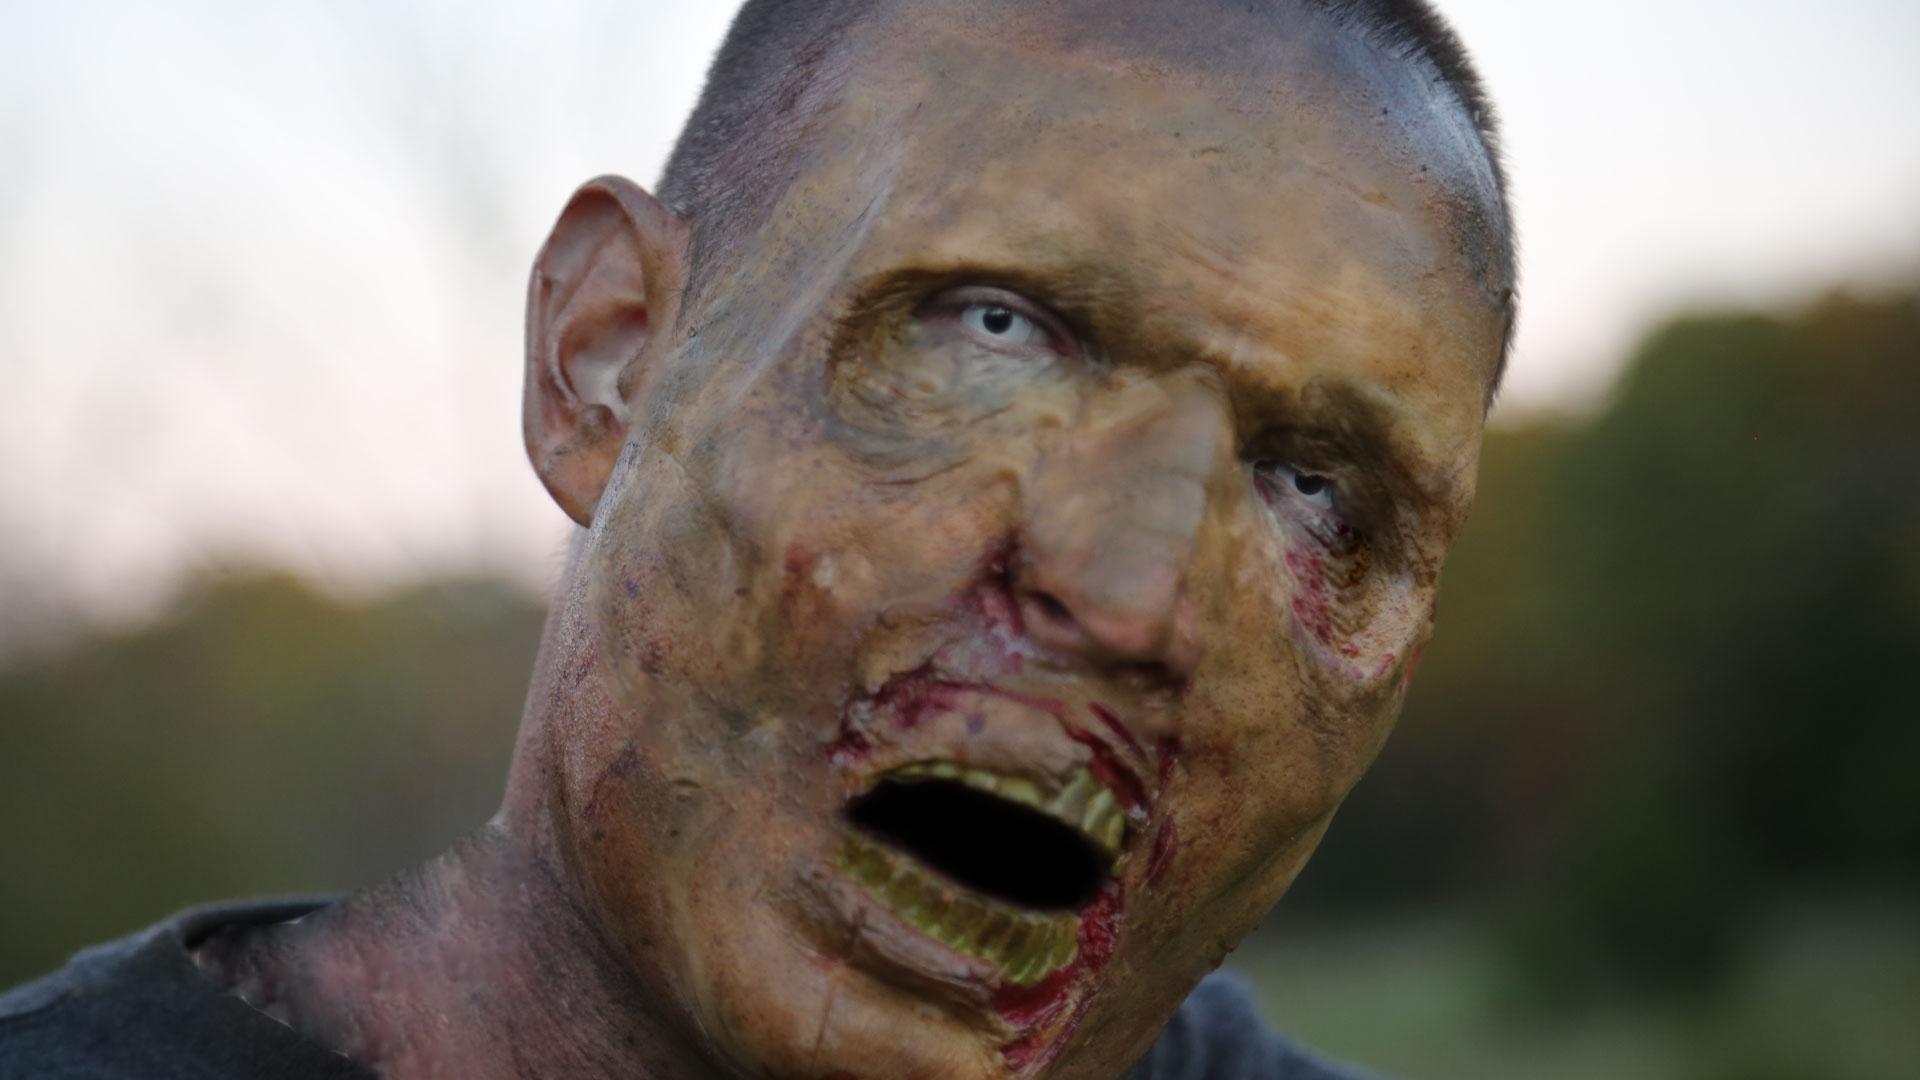 Mike Appel Zombie 005_00000 Final